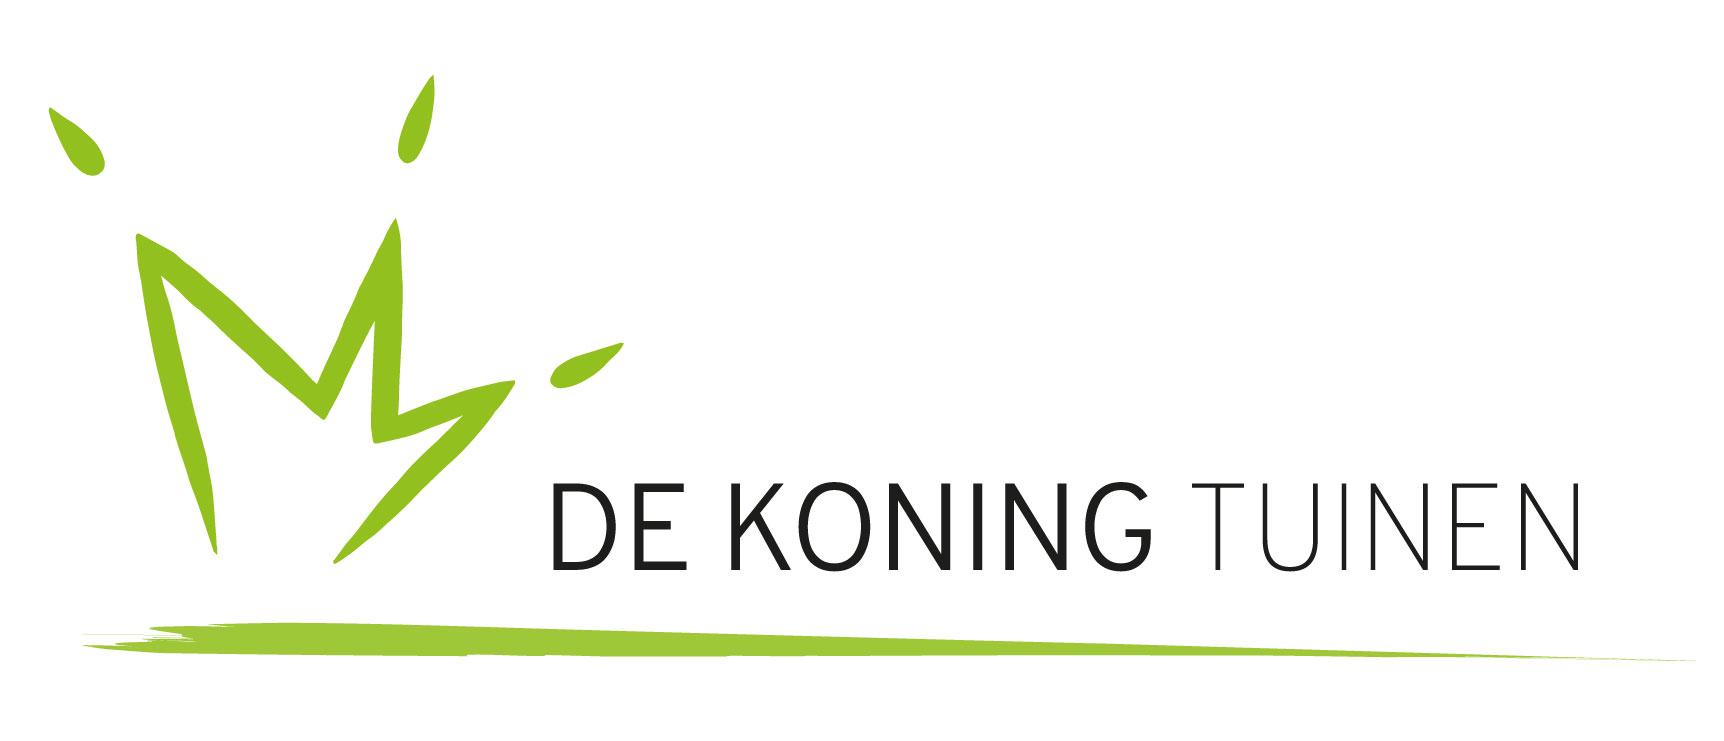 De Koning Tuinen | Tuinonderhoud | Tuinwerkzaamheden